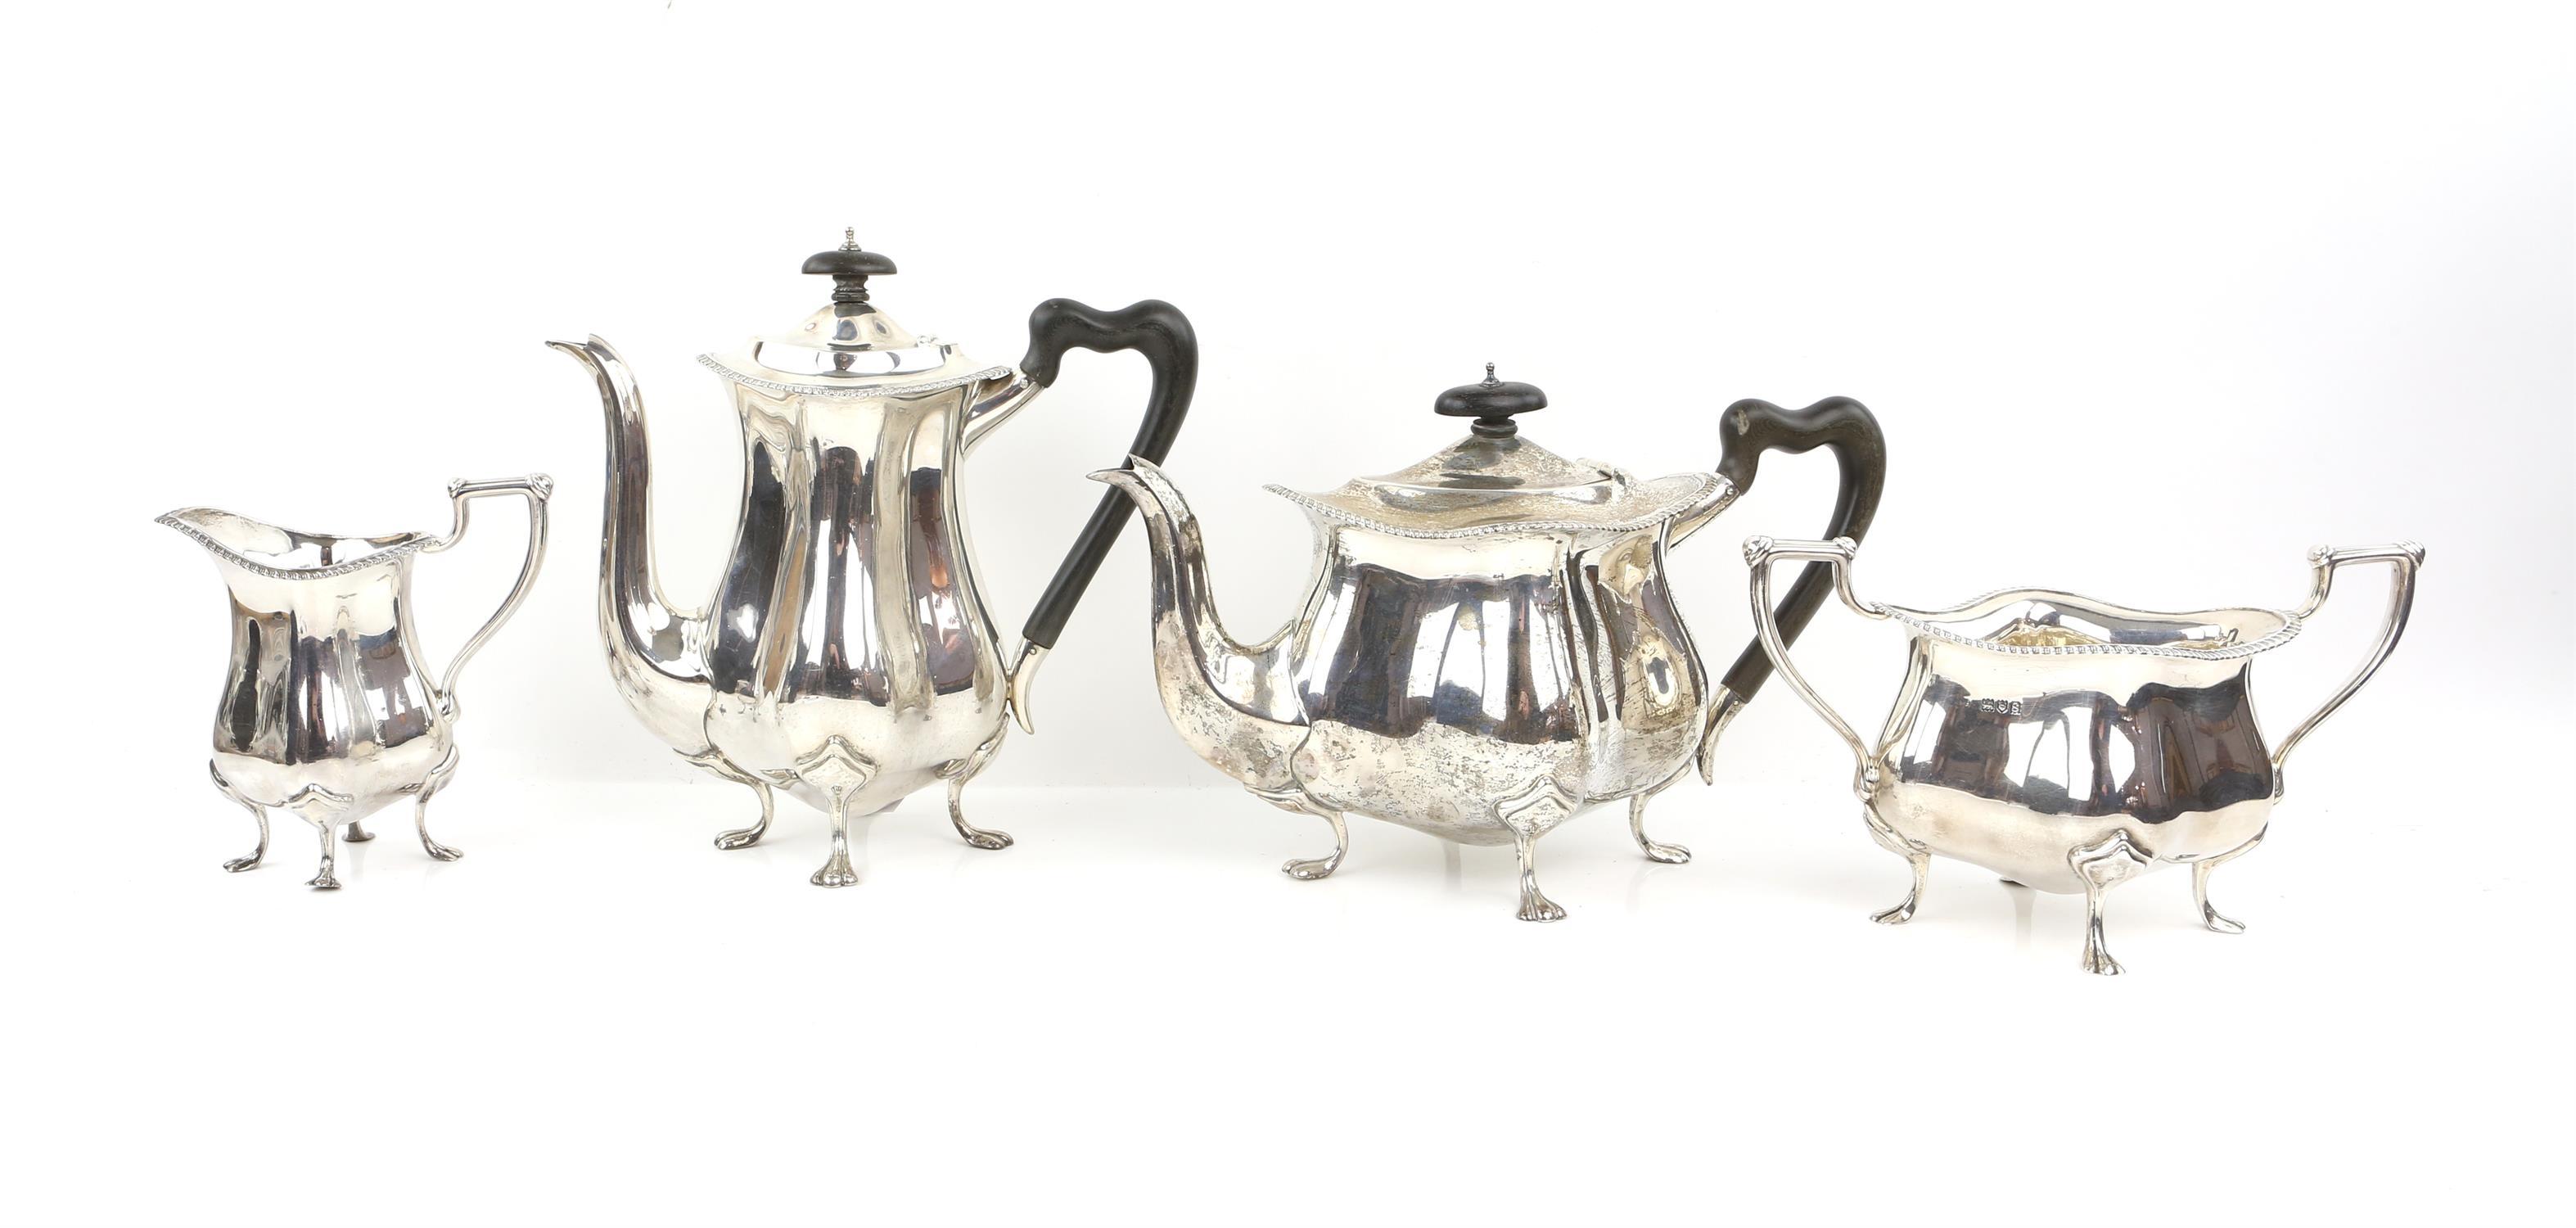 Four piece silver tea and coffee service of fluted diamond shape comprising Coffee Pot, Tea Pot,